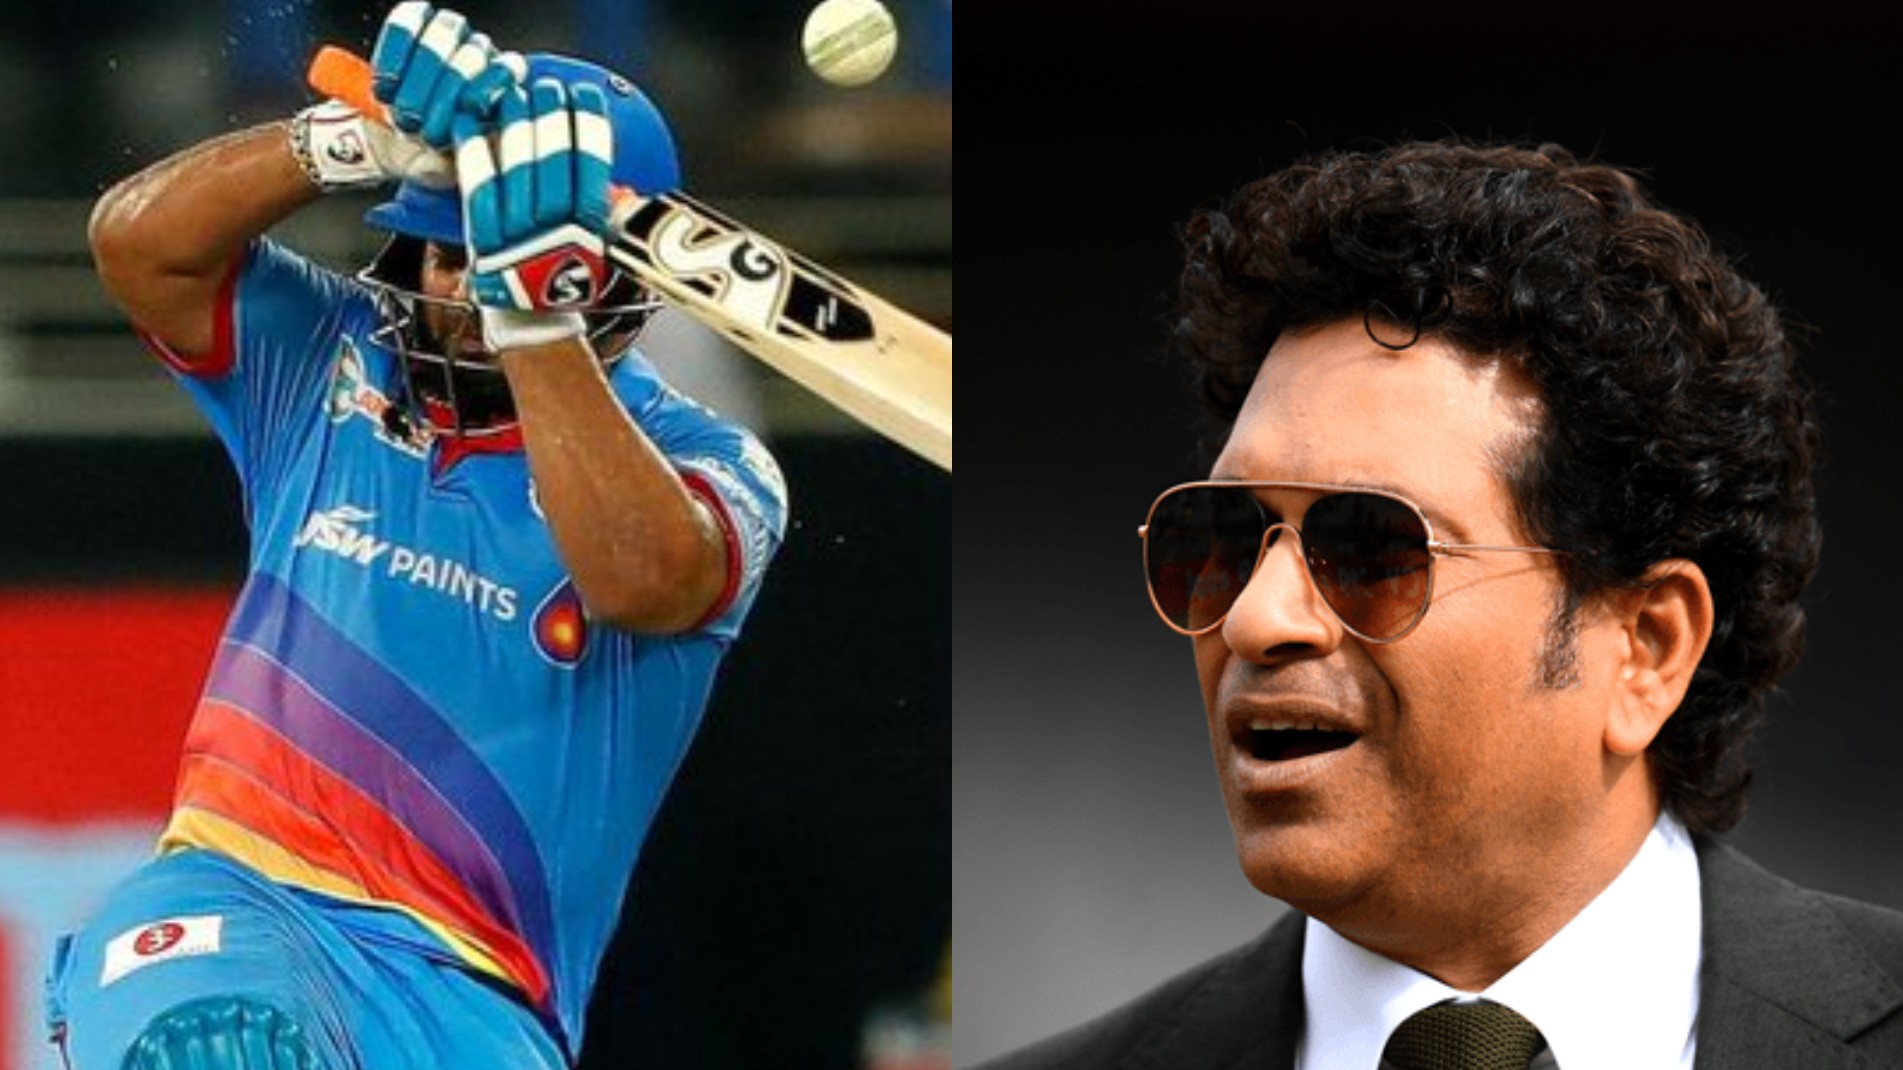 IPL 2020: Sachin Tendulkar lauds Rishabh Pant for his 'unbelievable' baseball shot for a six